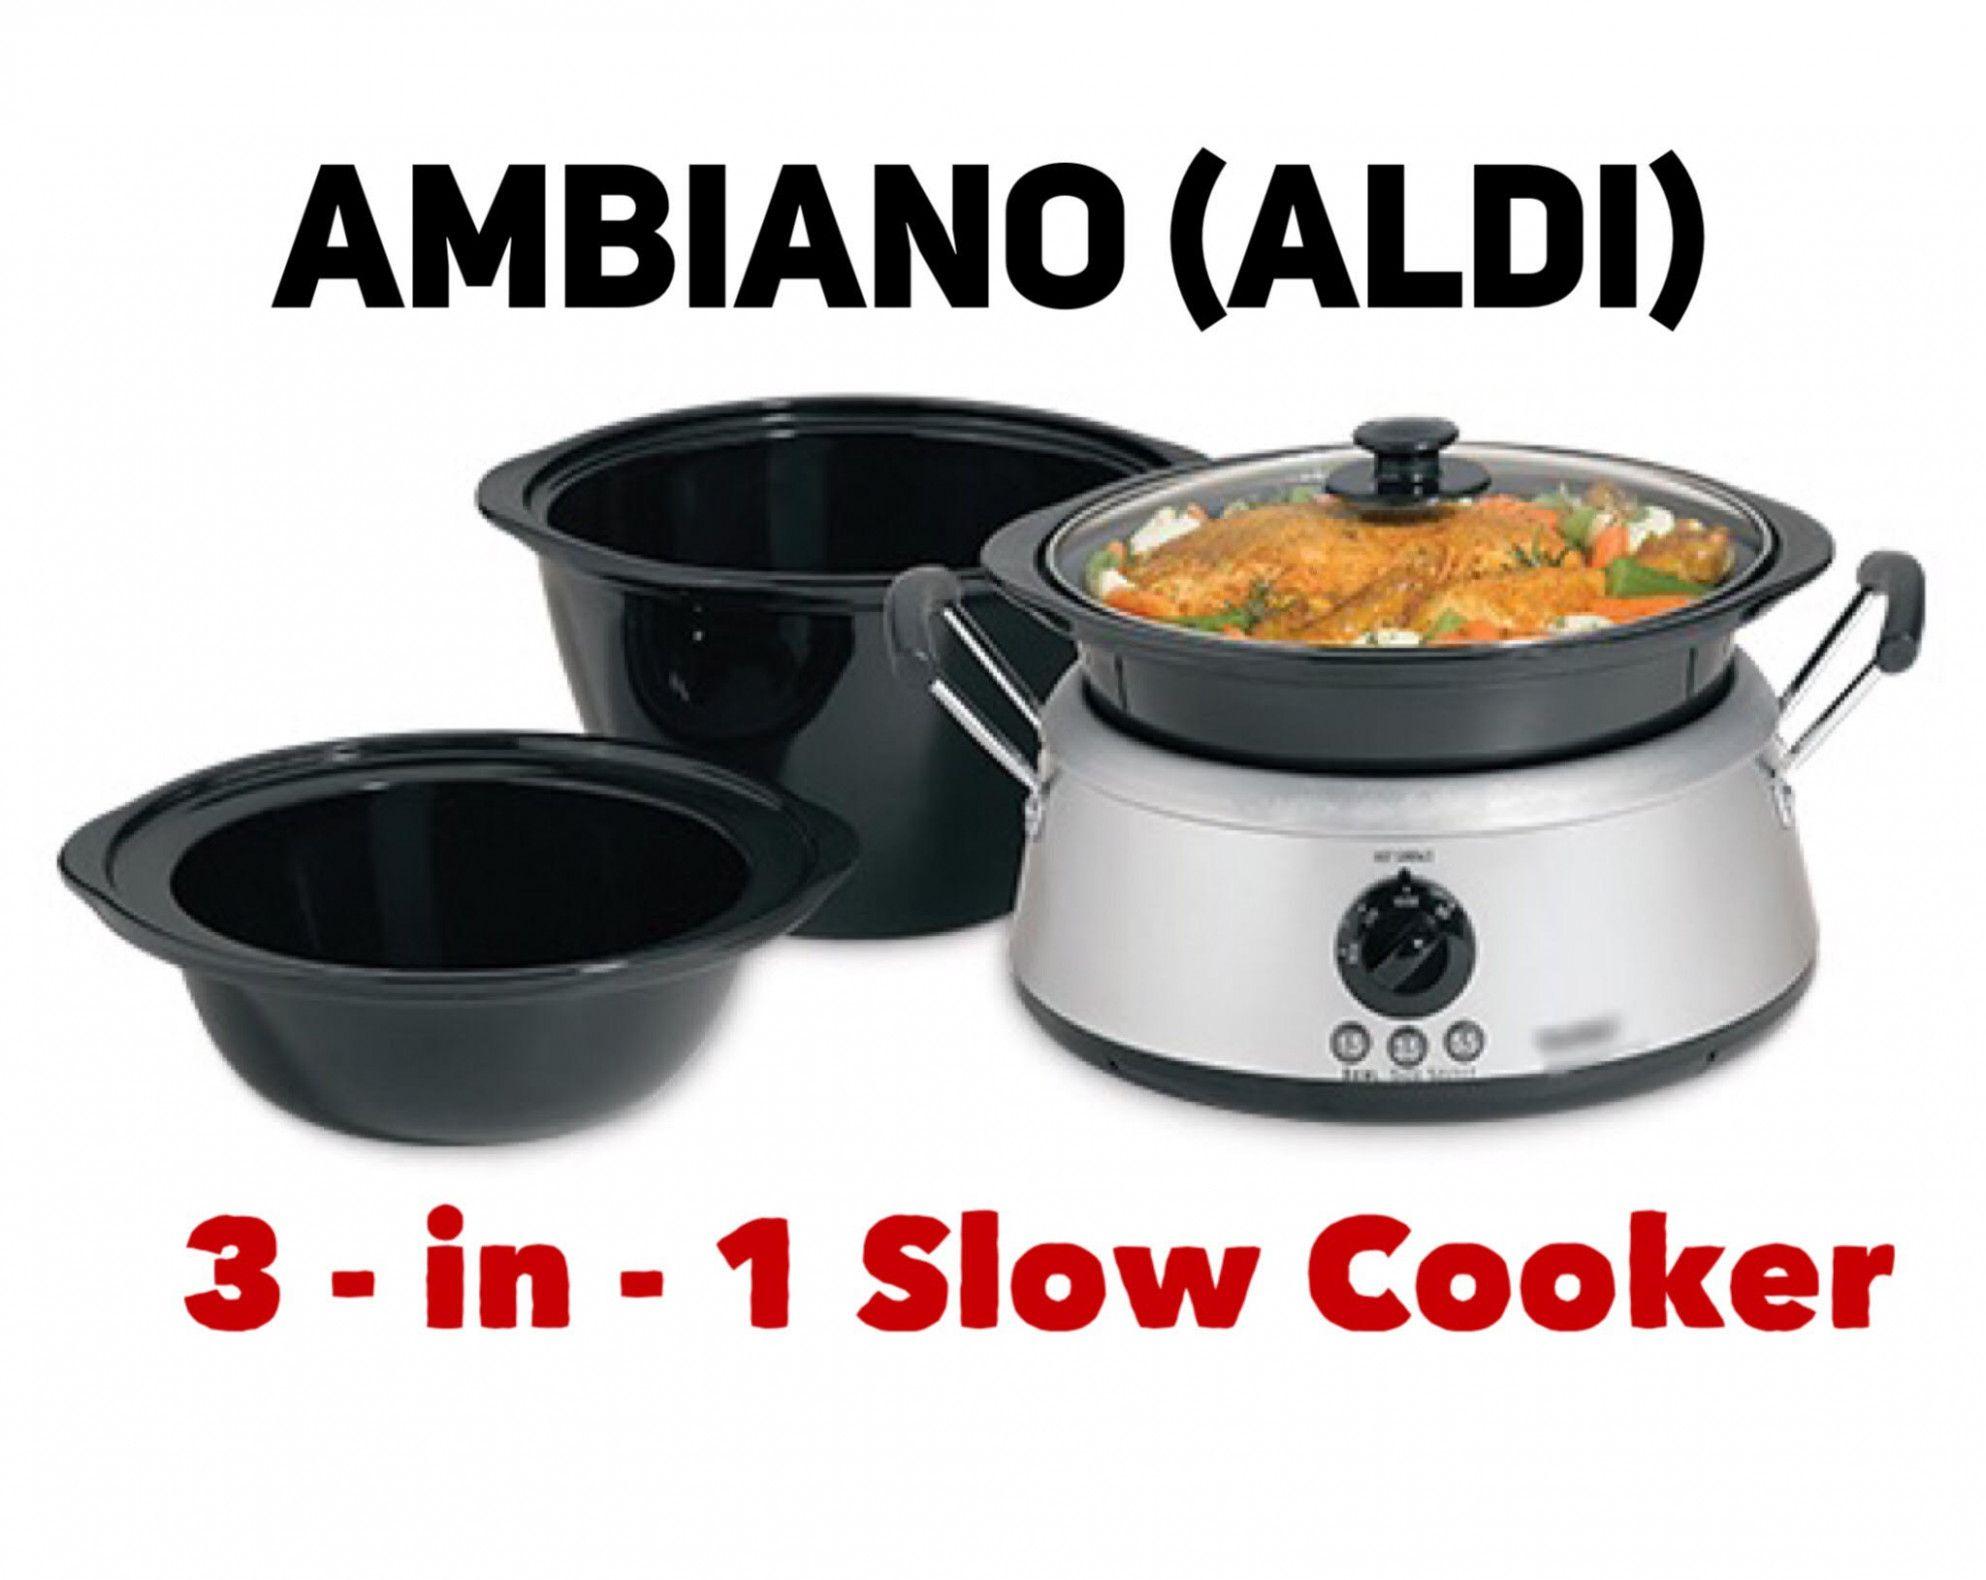 12 Kuchef Slow Cooker in 2020 | Slow cooker, Küche mit ...